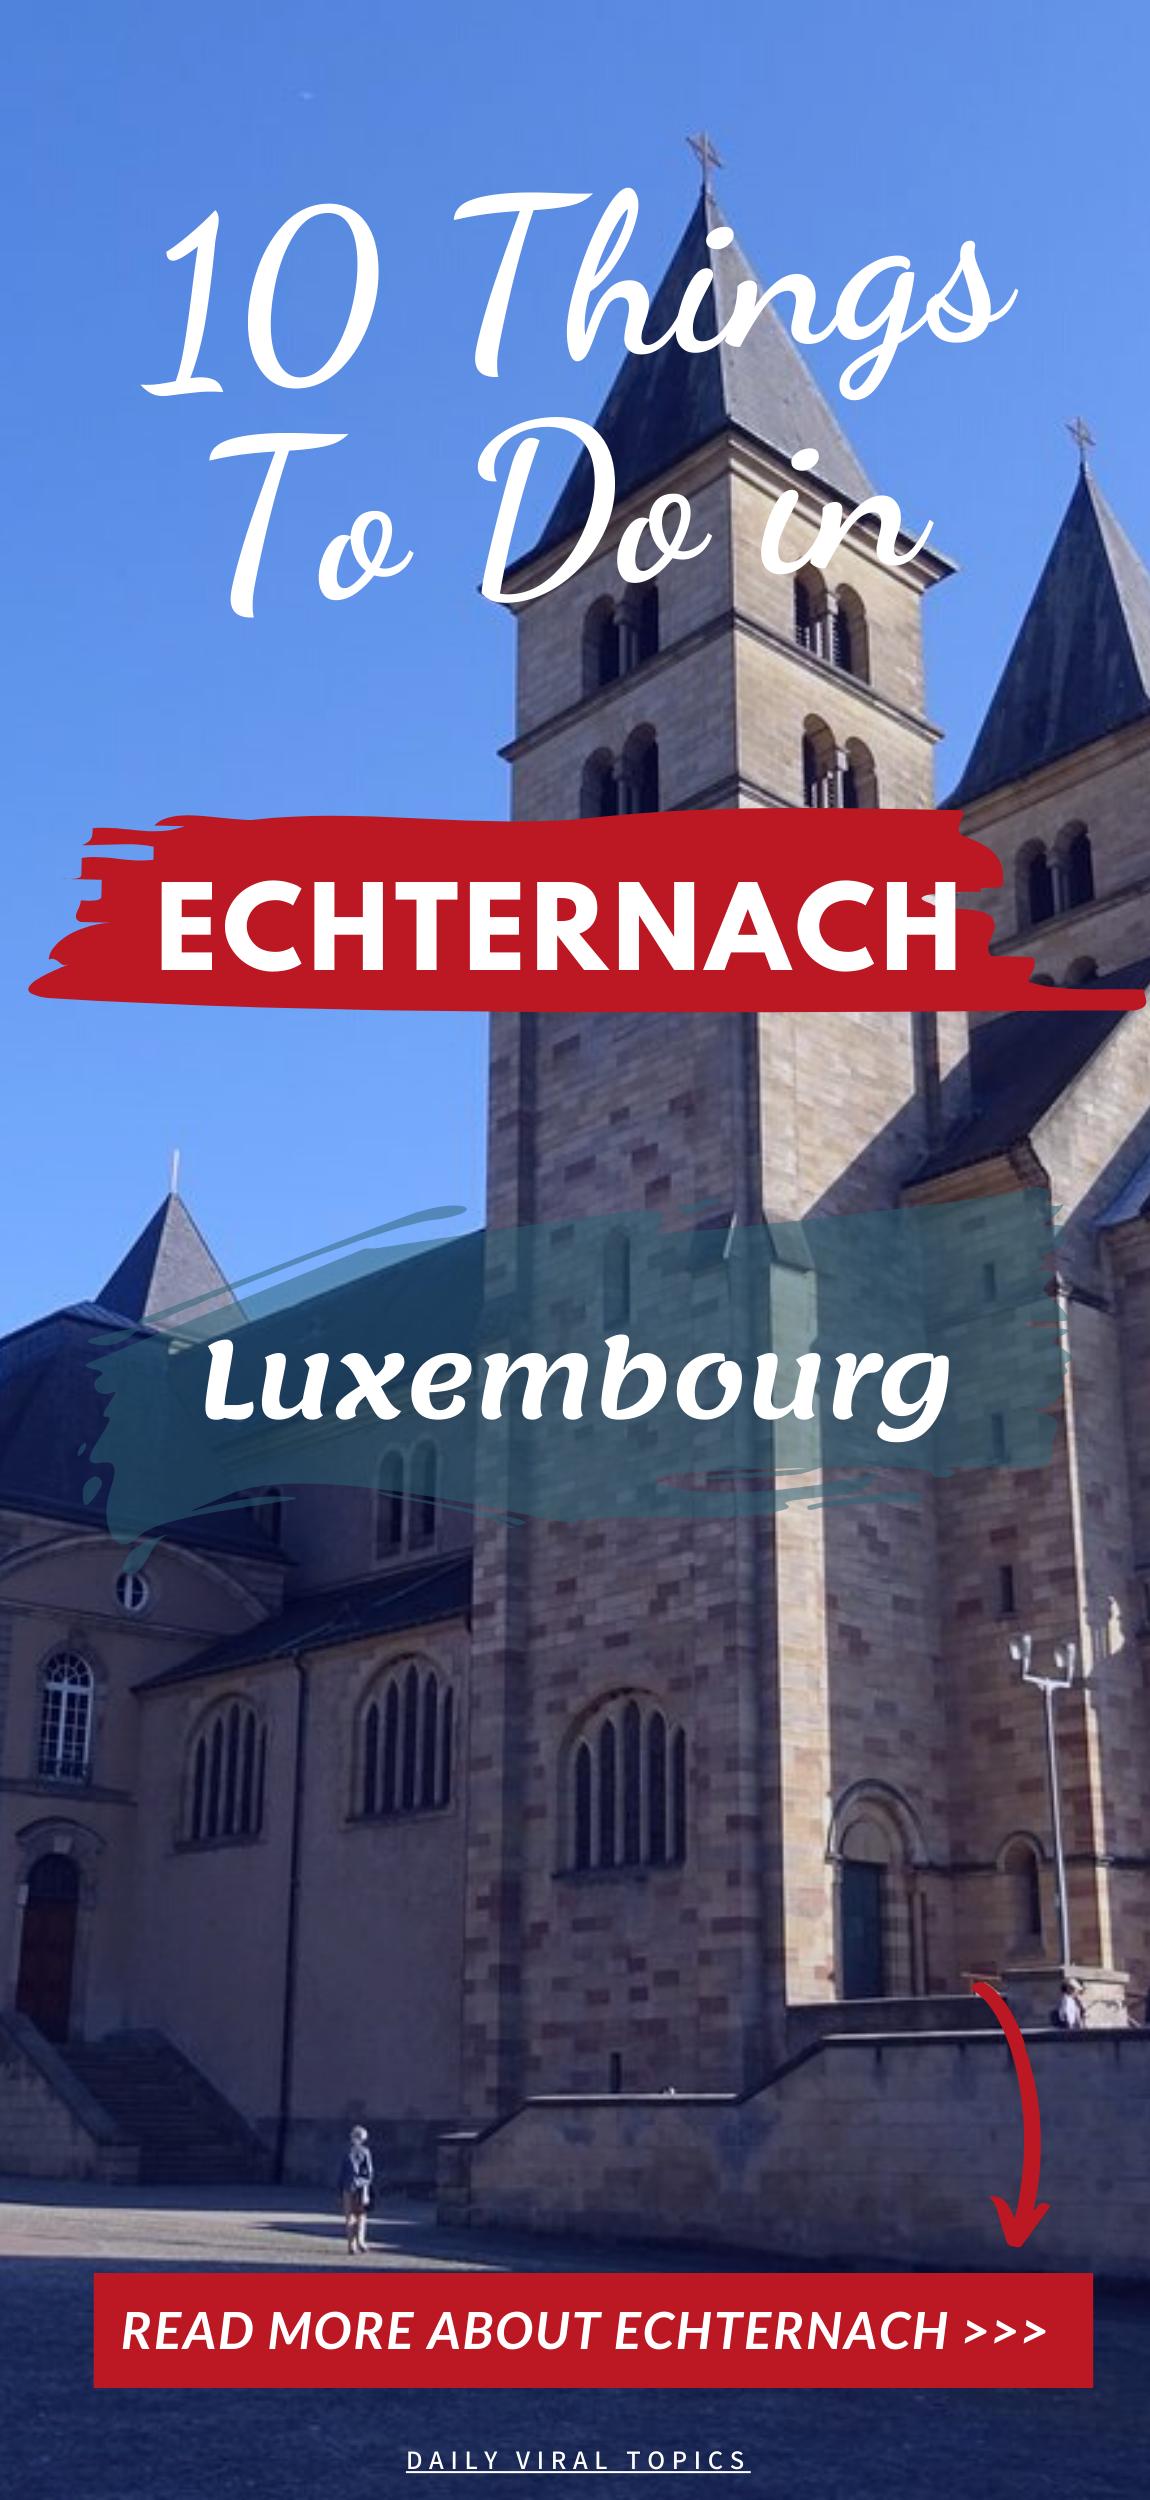 Please save it #dailyviraltopics #travel #travelphotography #nature #travelblog #places_to_visit #trip #Destinations #Echternach #Luxembourg